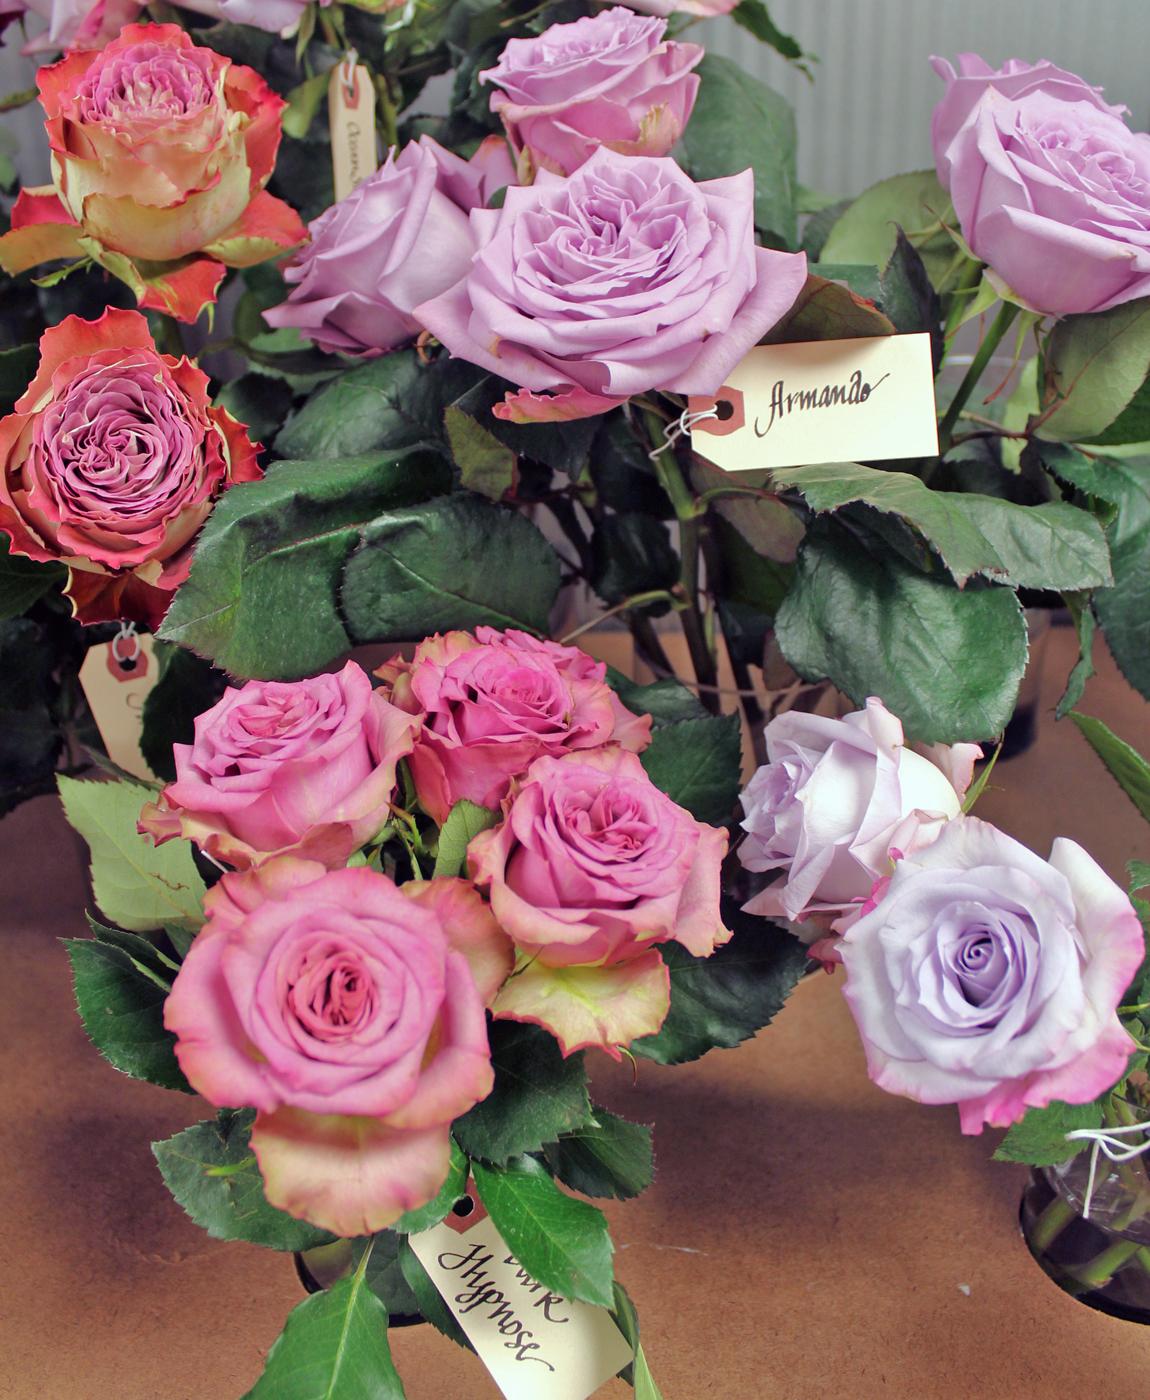 harvest-rose-8